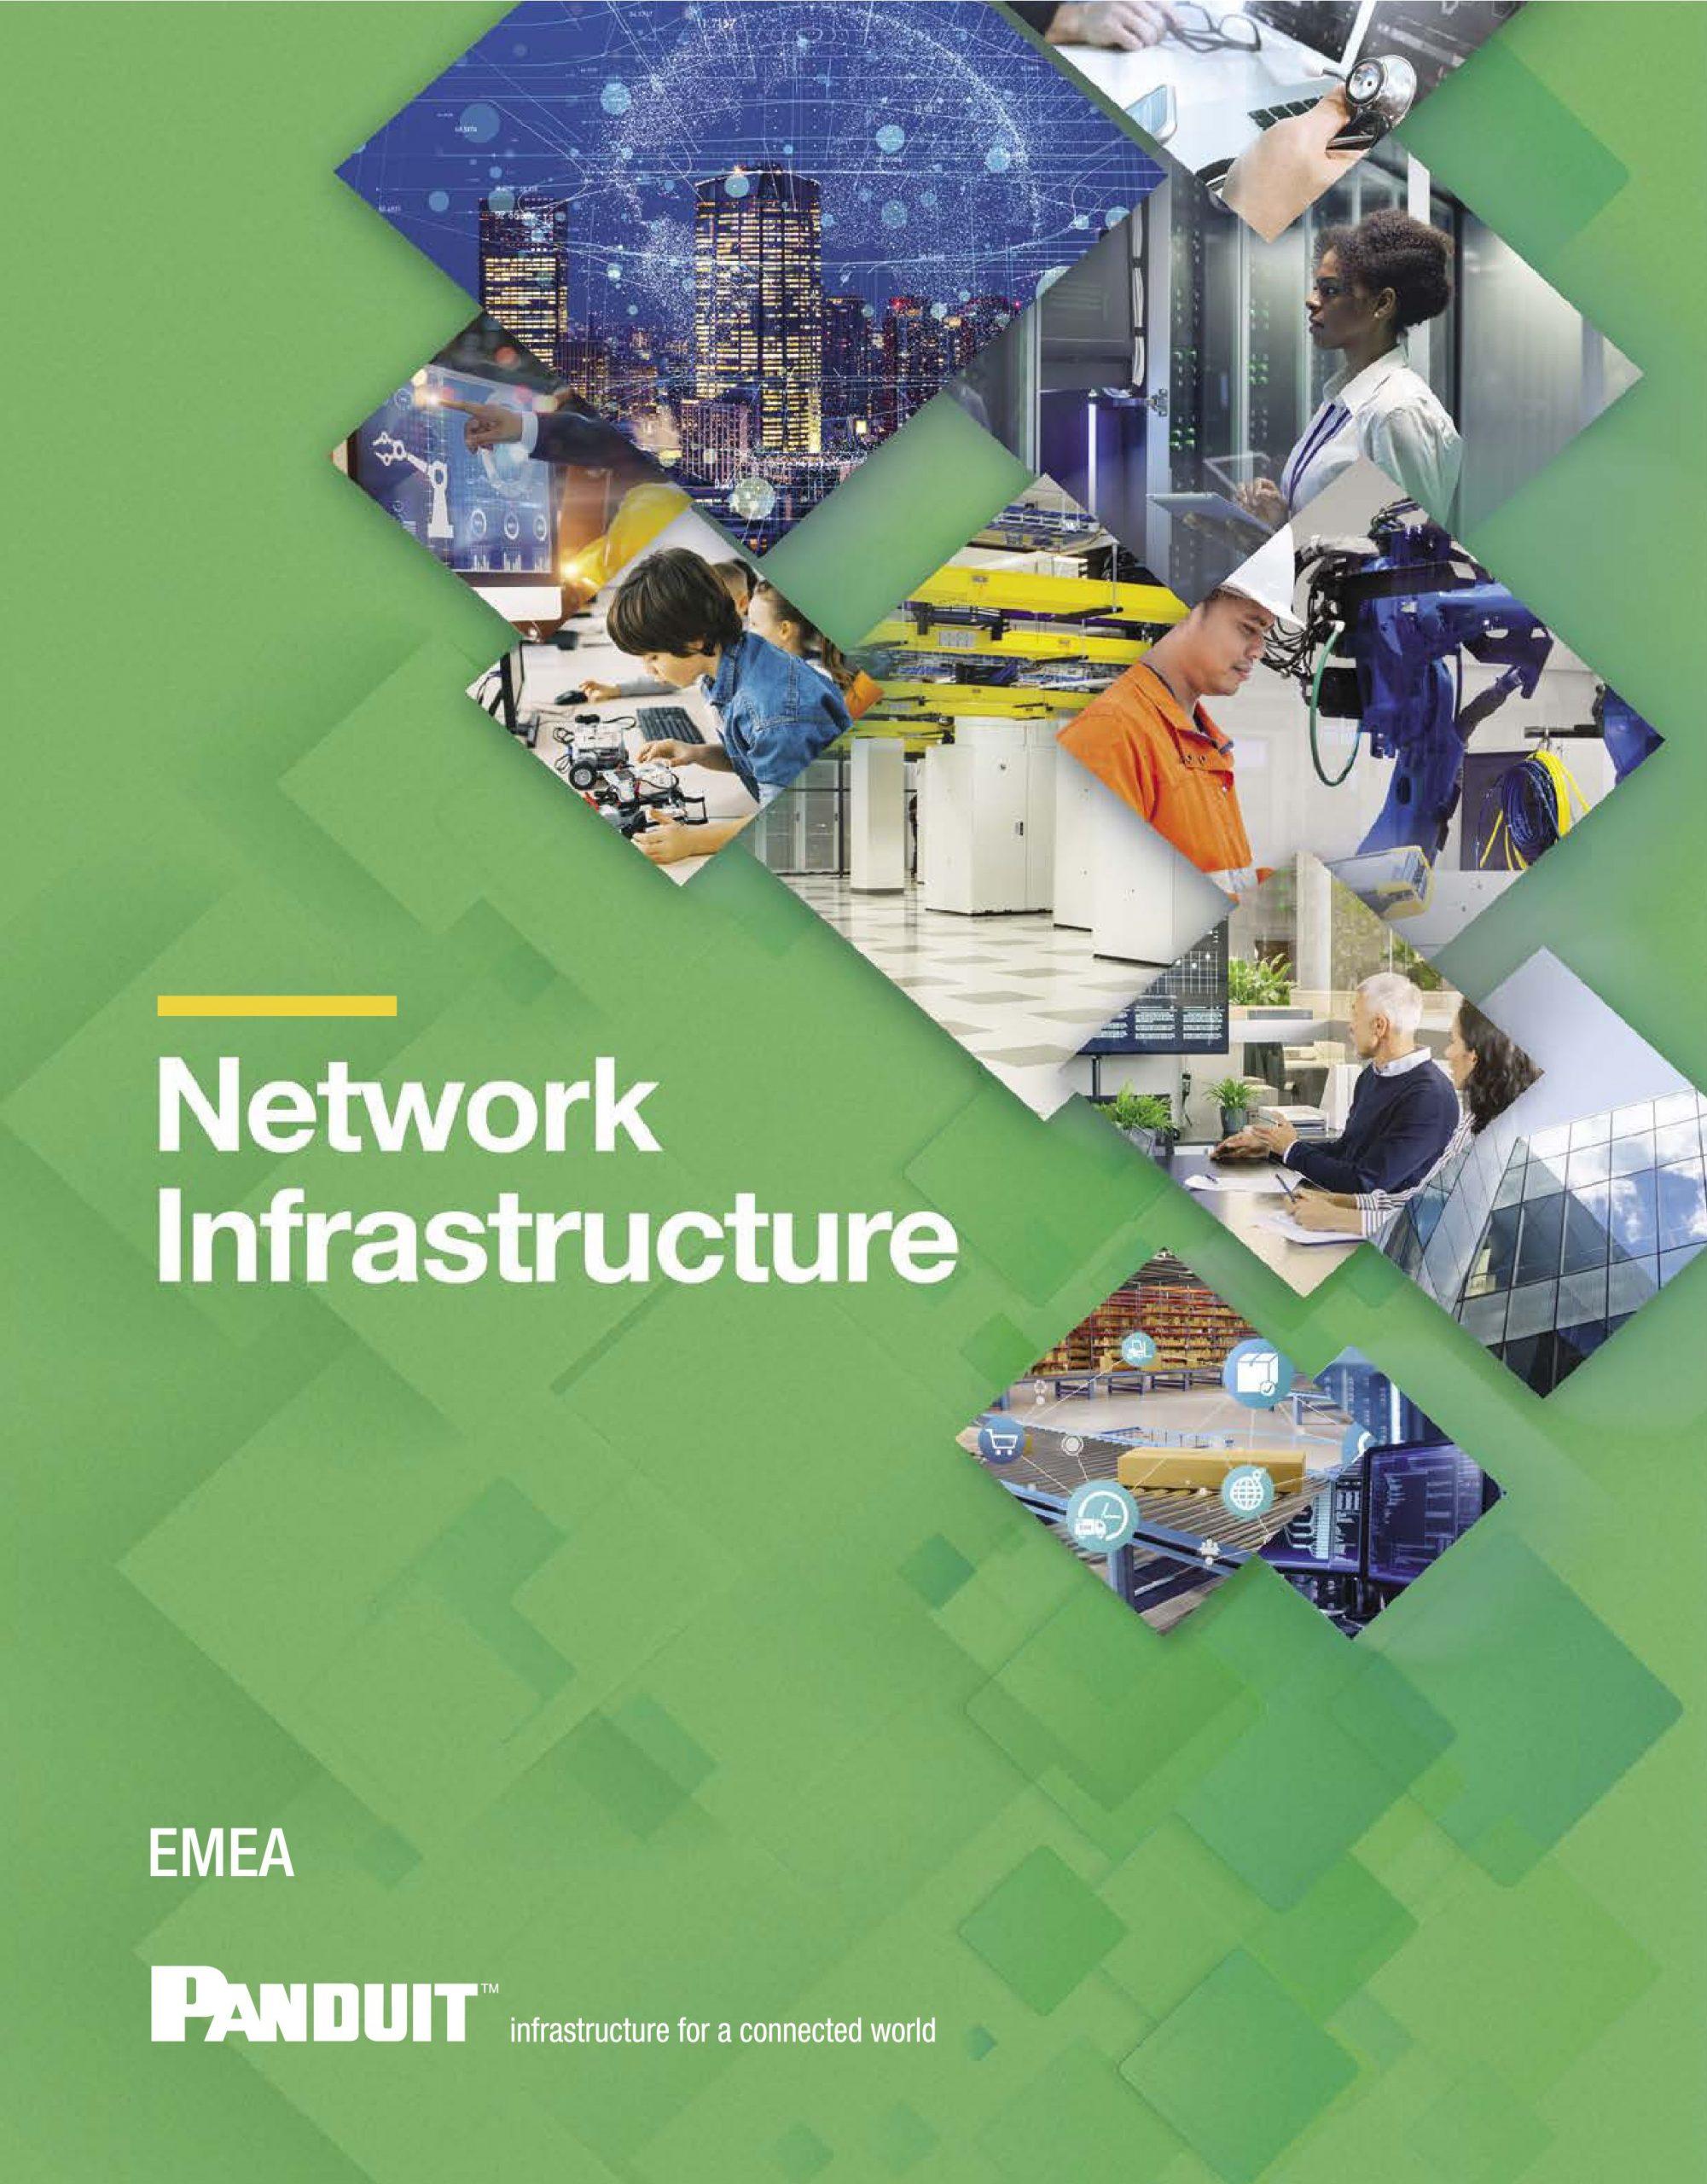 EMEA Netzwerkinfrastruktur Katalog 2021